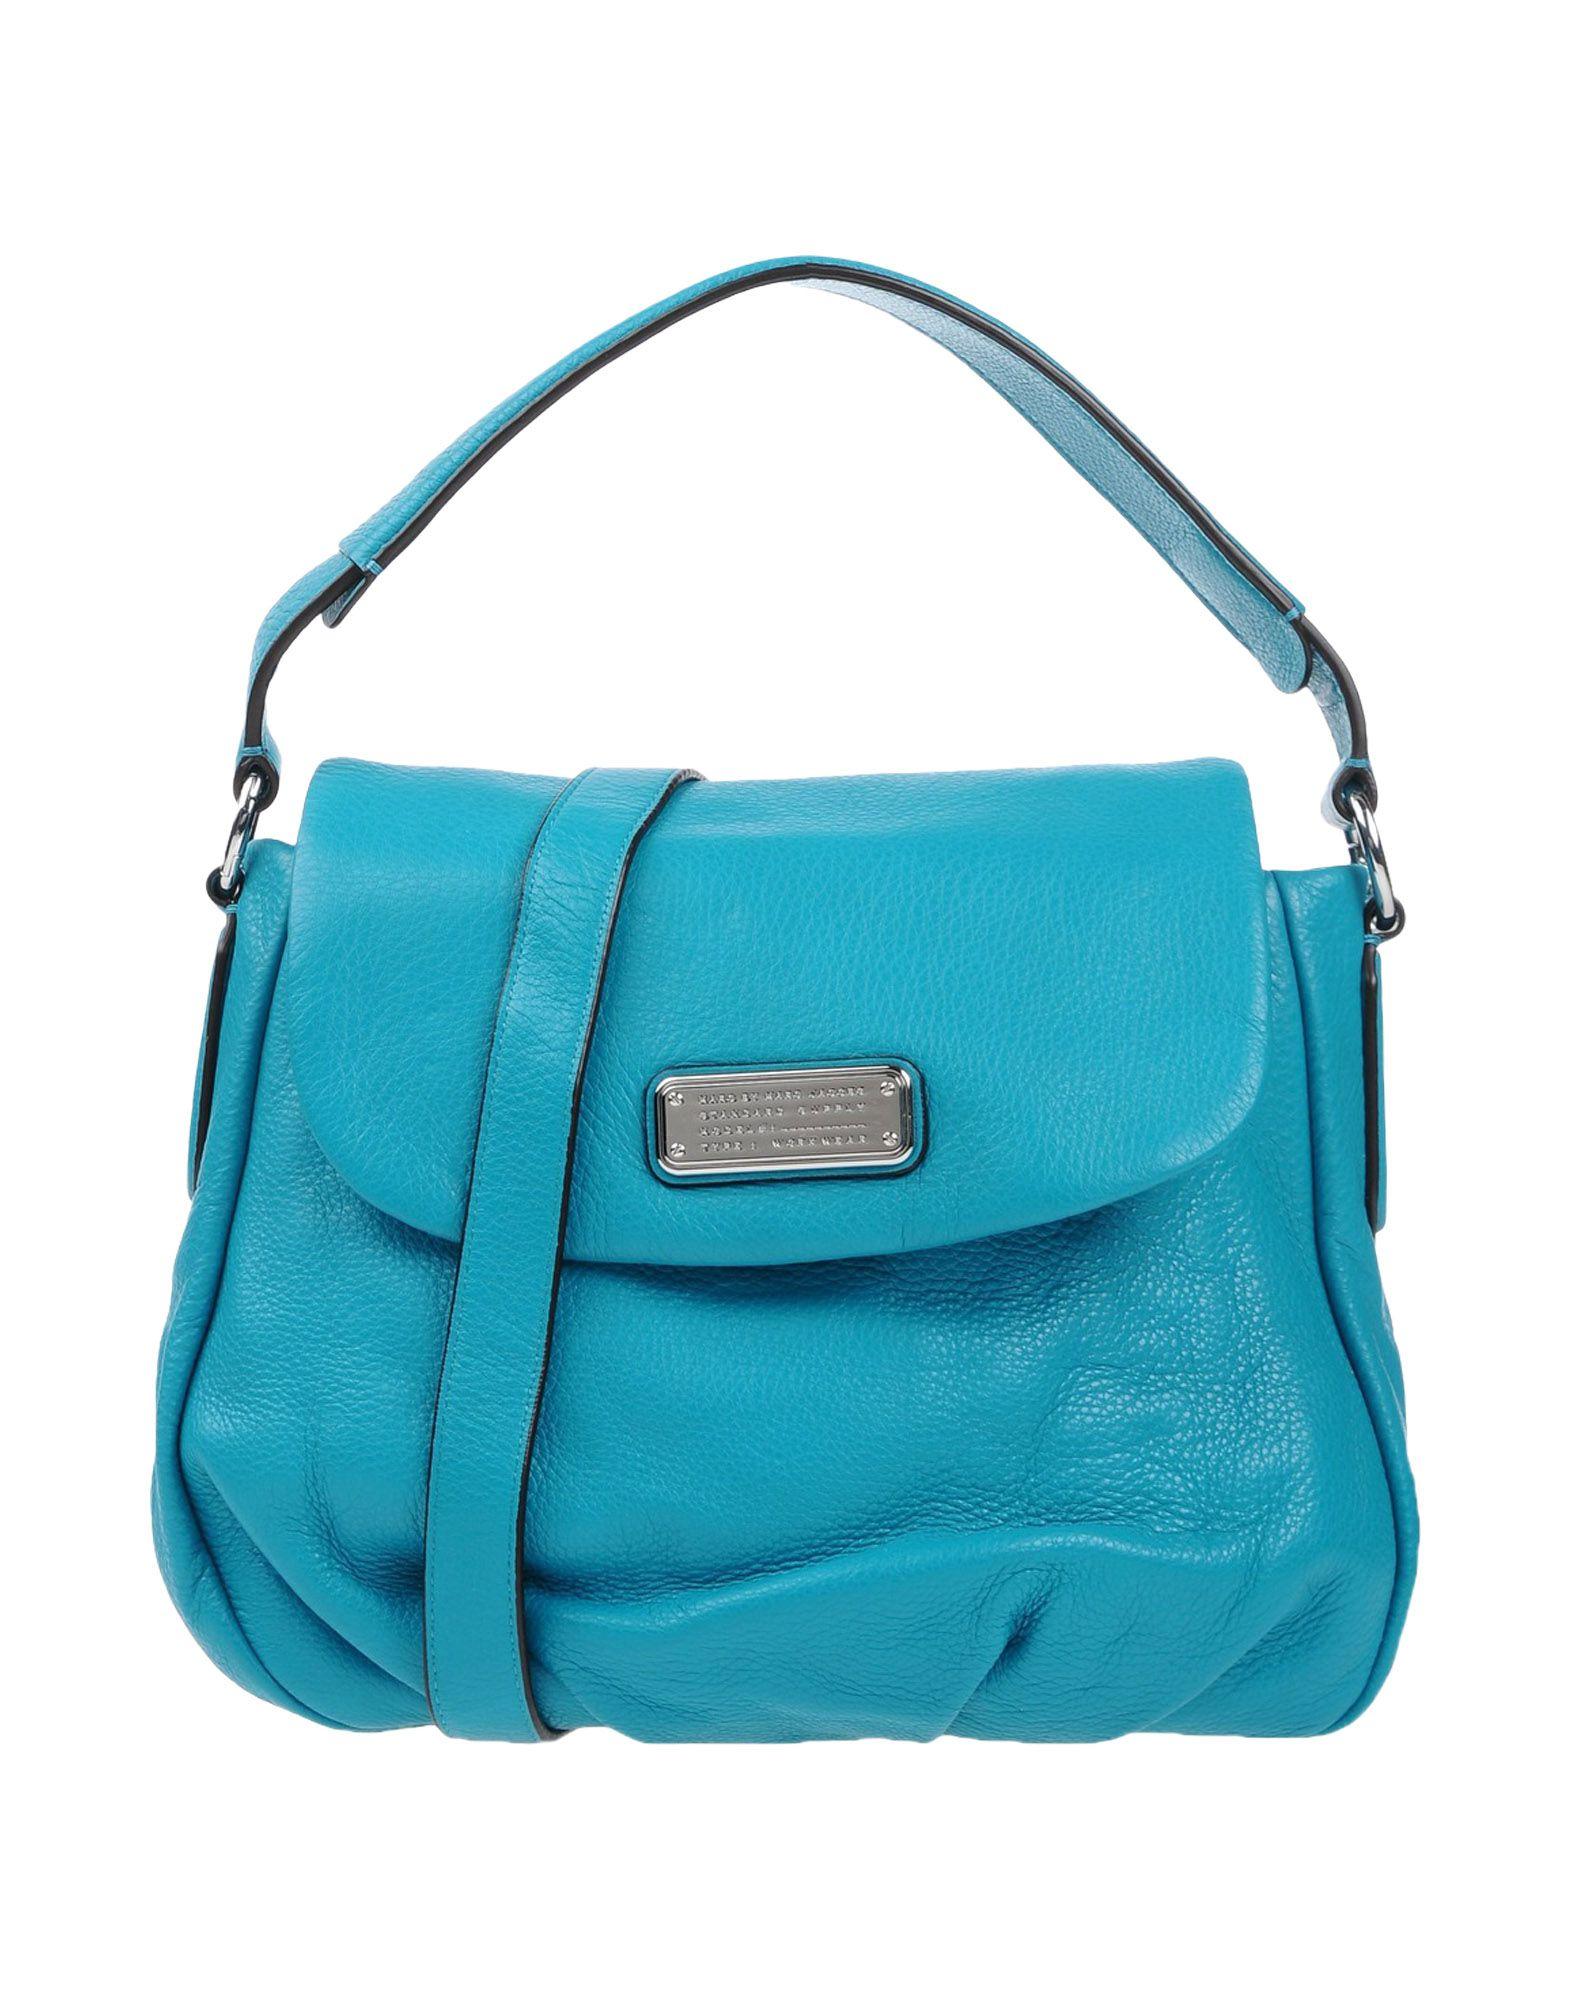 marc by marc jacobs female marc by marc jacobs handbags